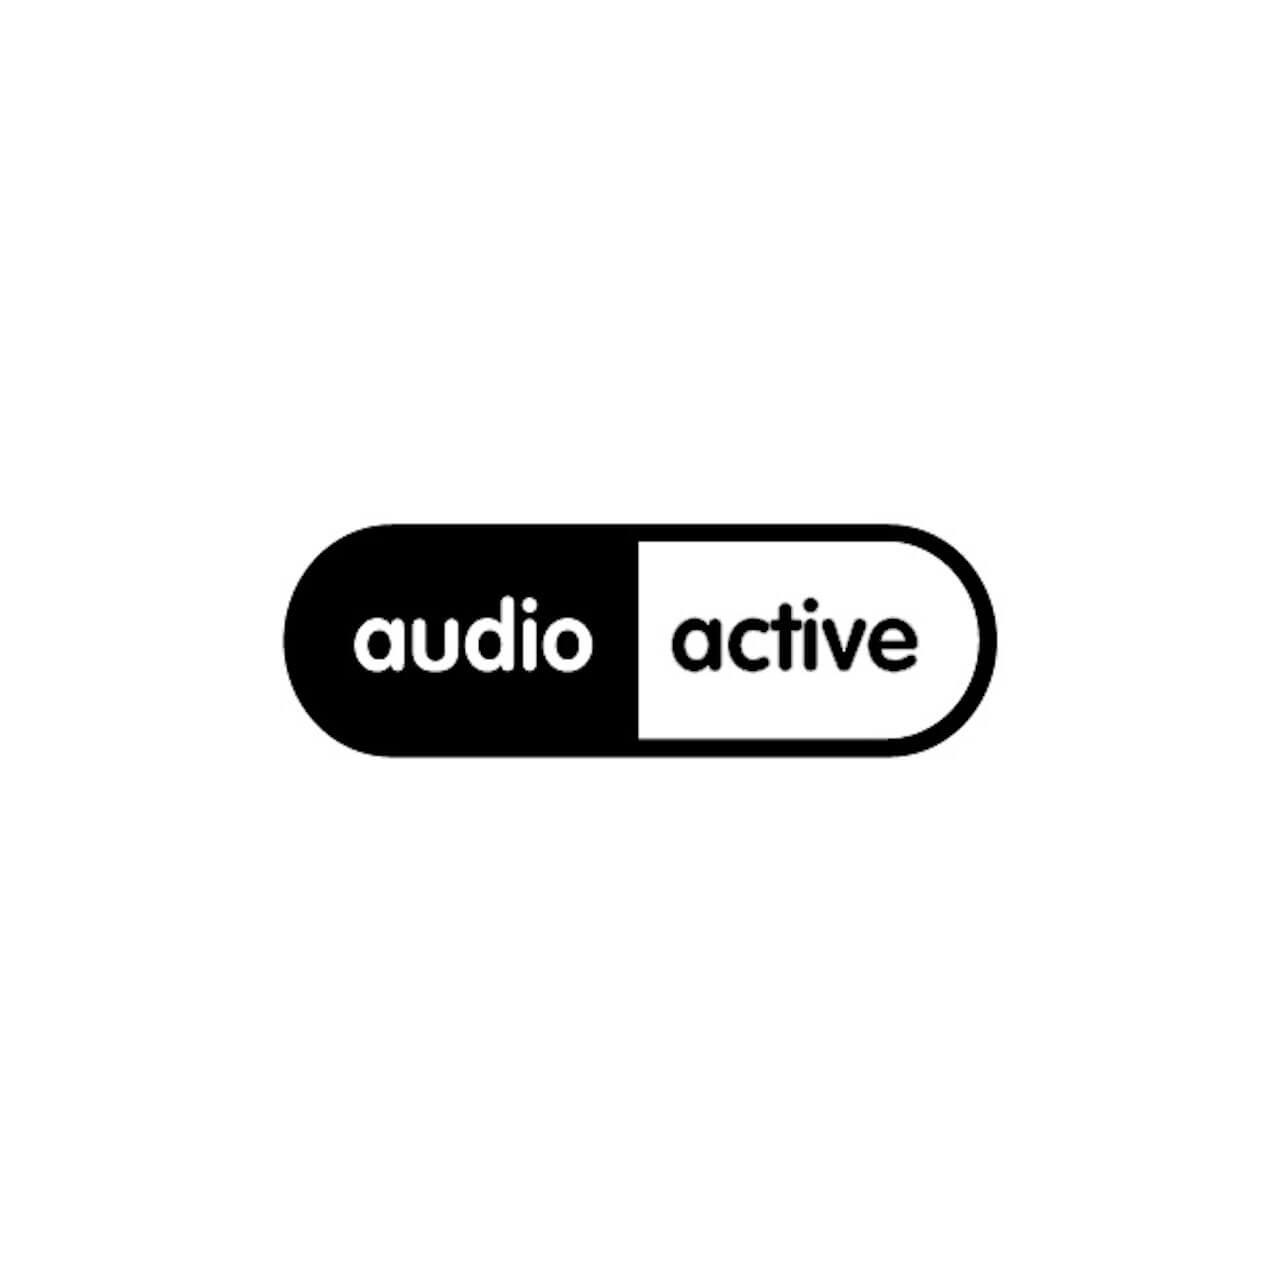 LIQUIDROOMのコラボTシャツ企画に伝説のダブ・バンドaudio activeが参加決定 music200608-liquidroom-audioactive-2